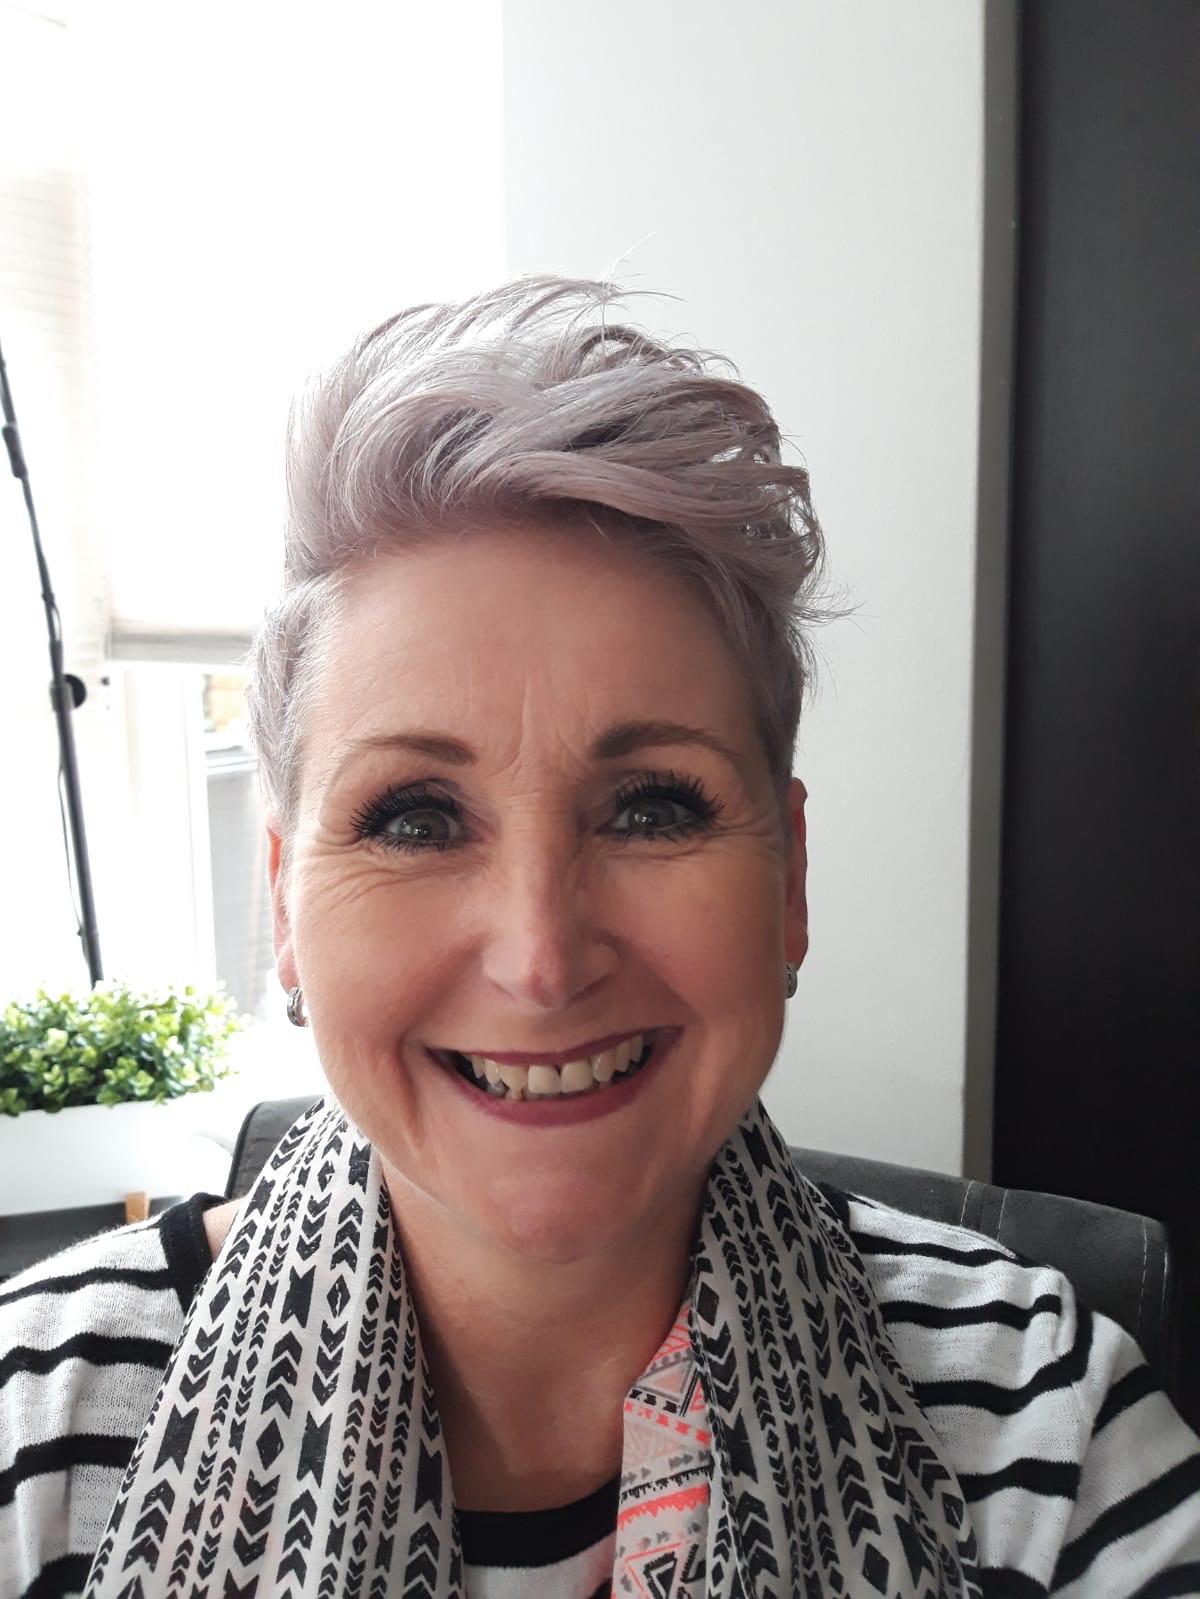 Anita - Kapper bij Bennies Barber Shop Doesburg